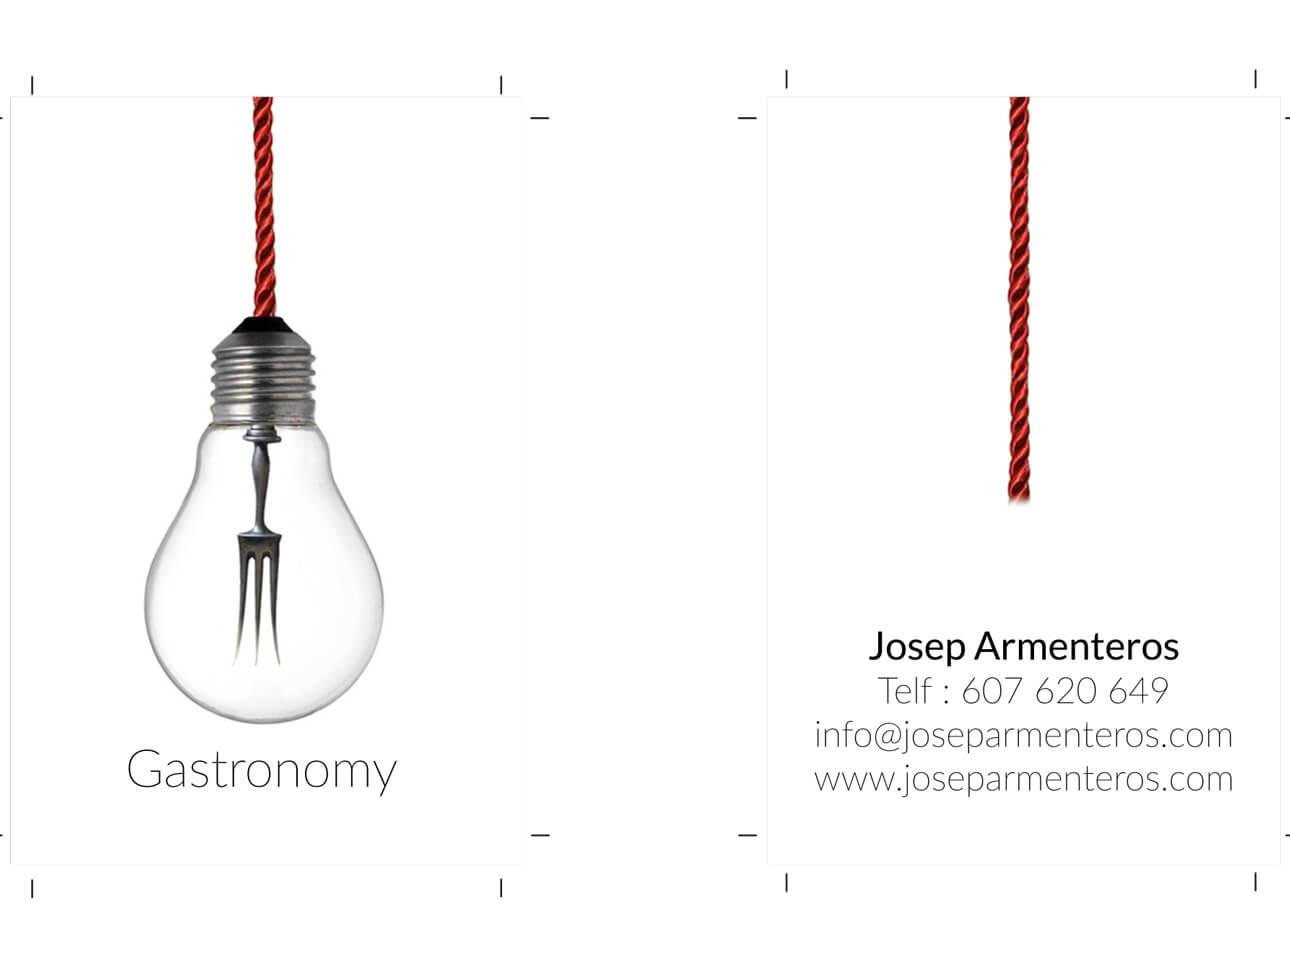 Josep Armenteros Gastronomy (tarjeta)